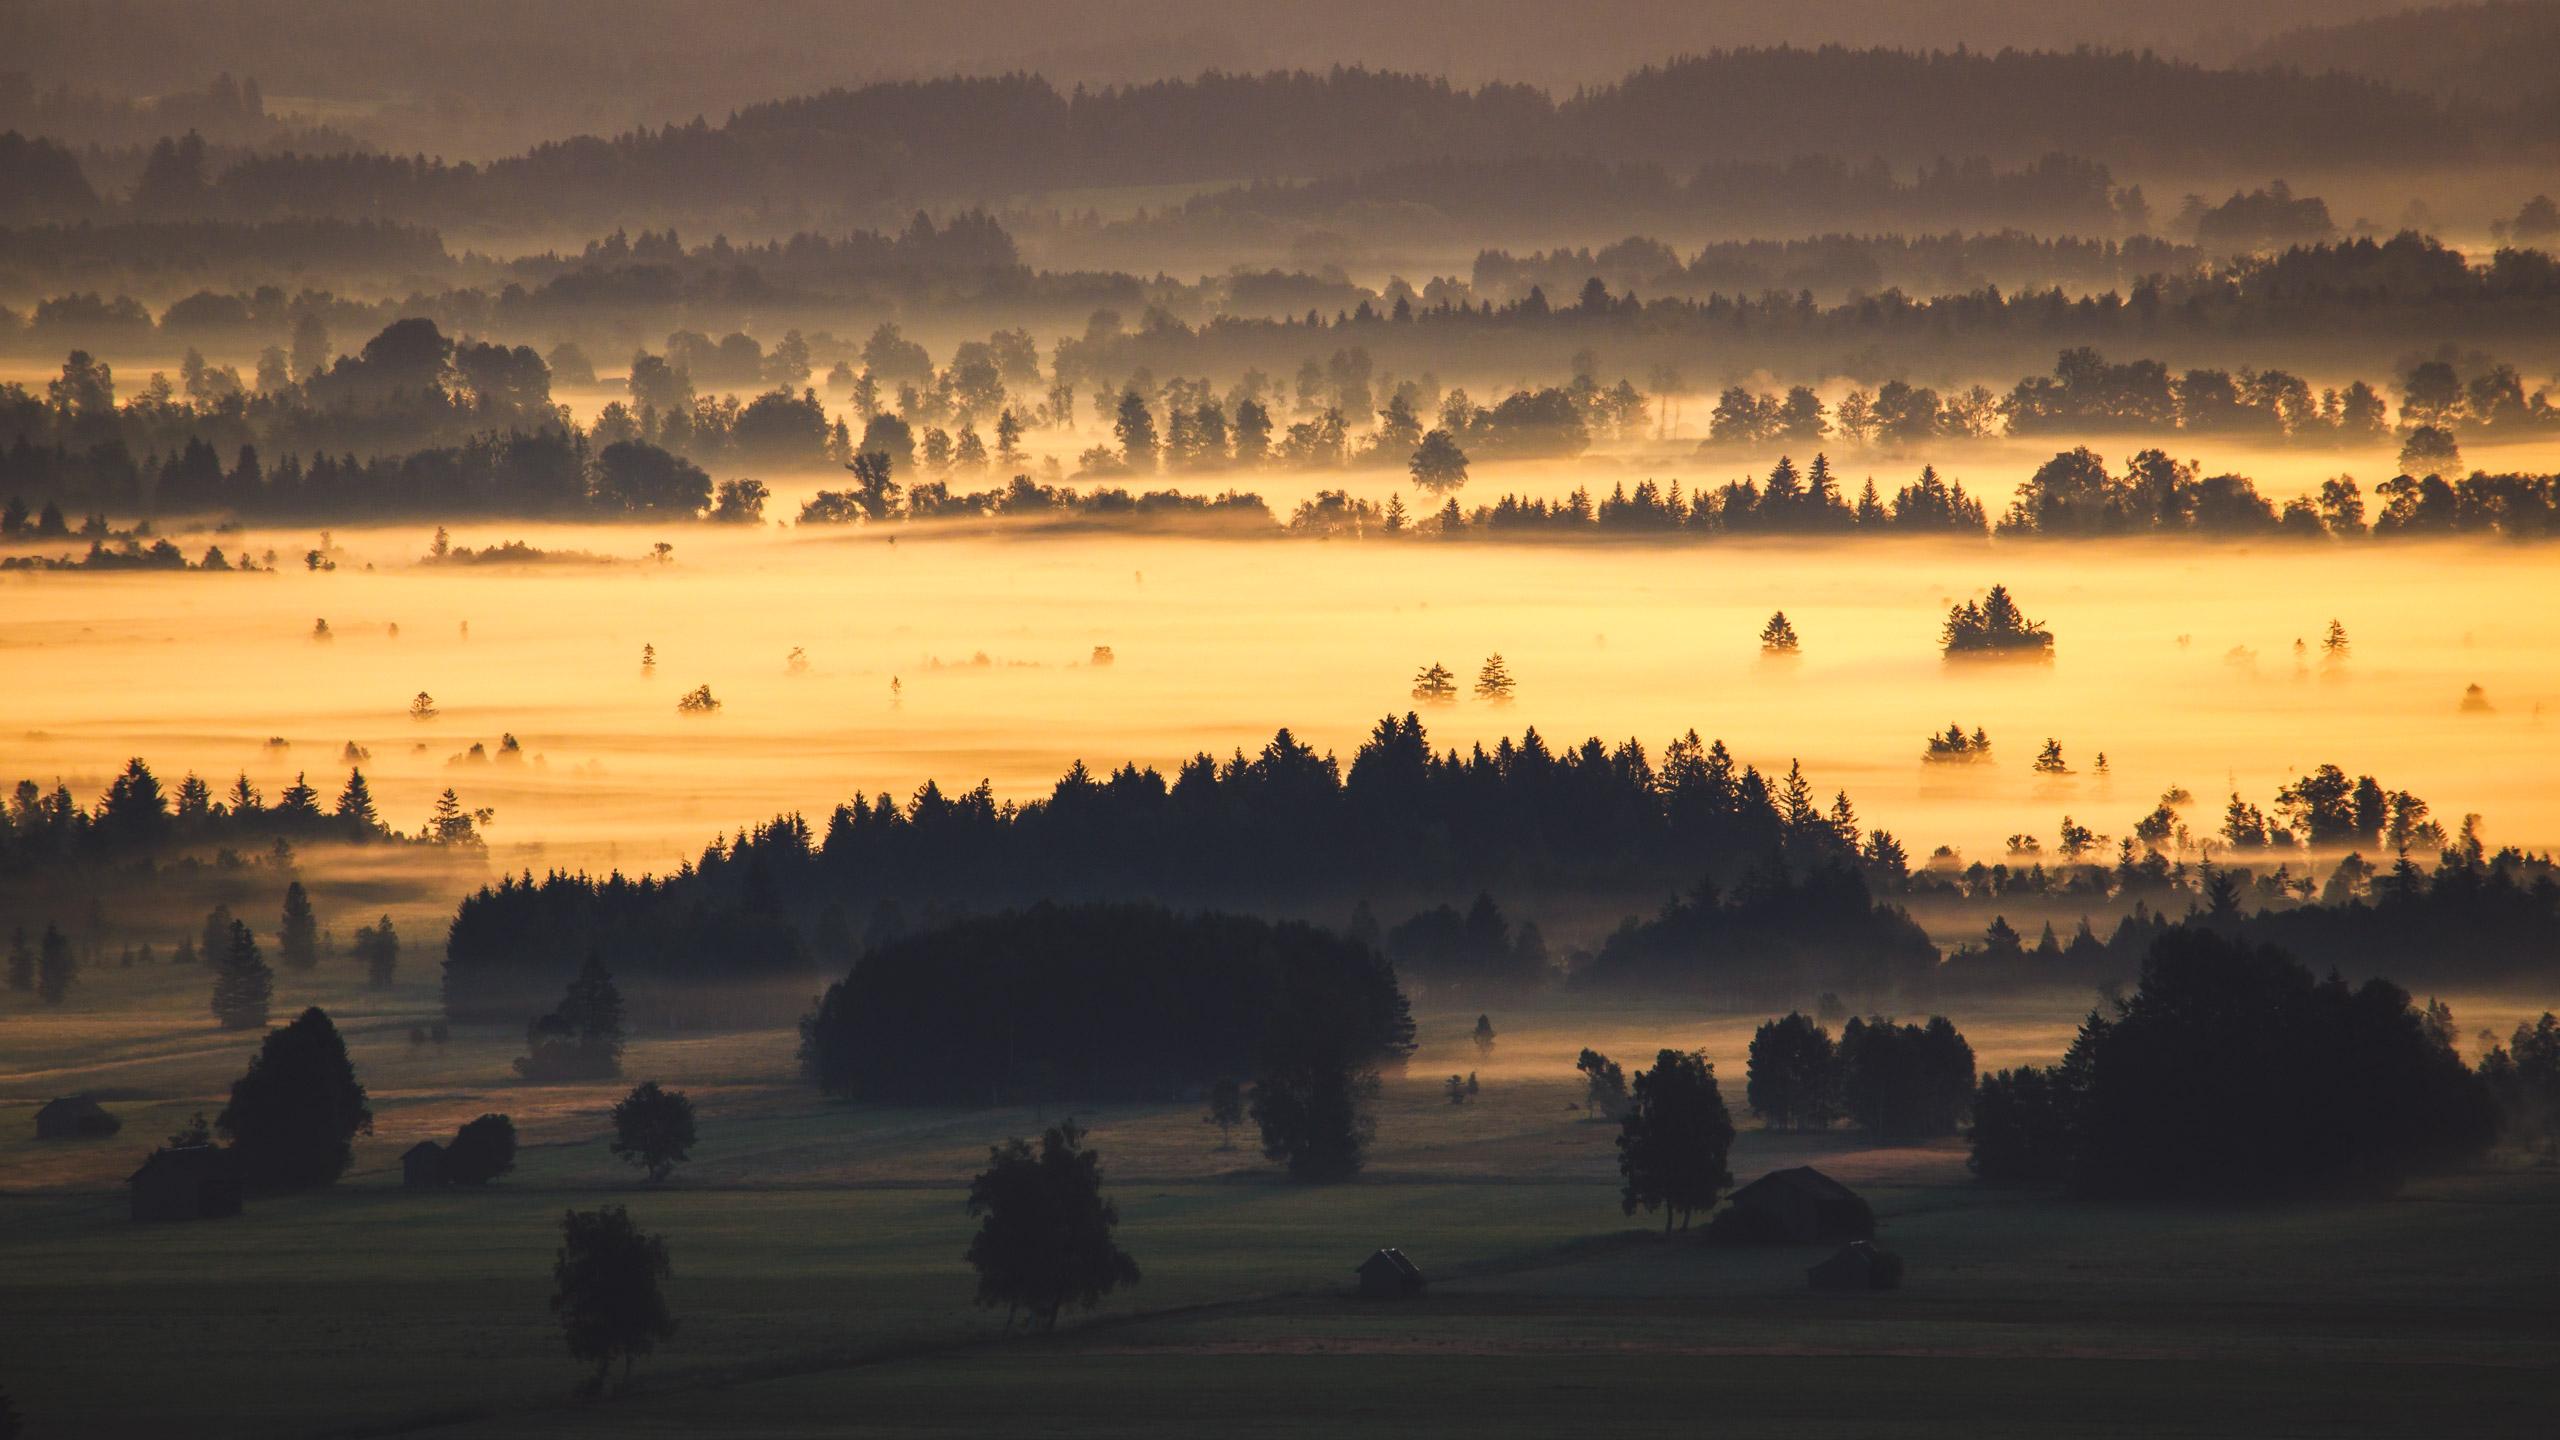 Tom_Schueler_Fotografie_Landschaft_Alpen_Dolomiten_13